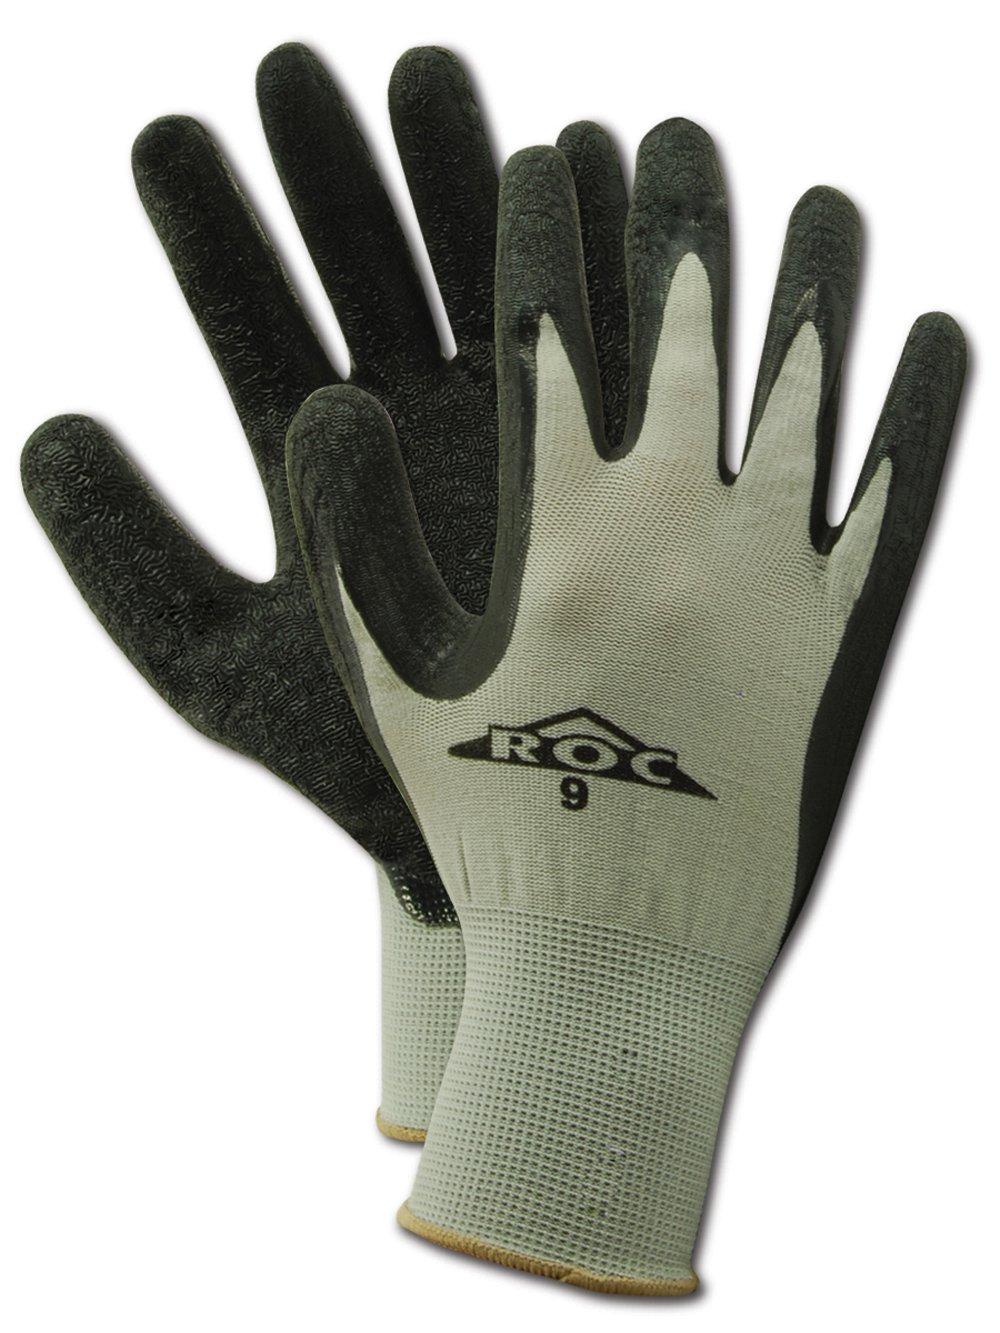 "MAGID ROC GP190 Nylon Glove, Black Latex Palm Coating, Knit Wrist Cuff, 10.5"" Length, Size 11  (12 Pair)"